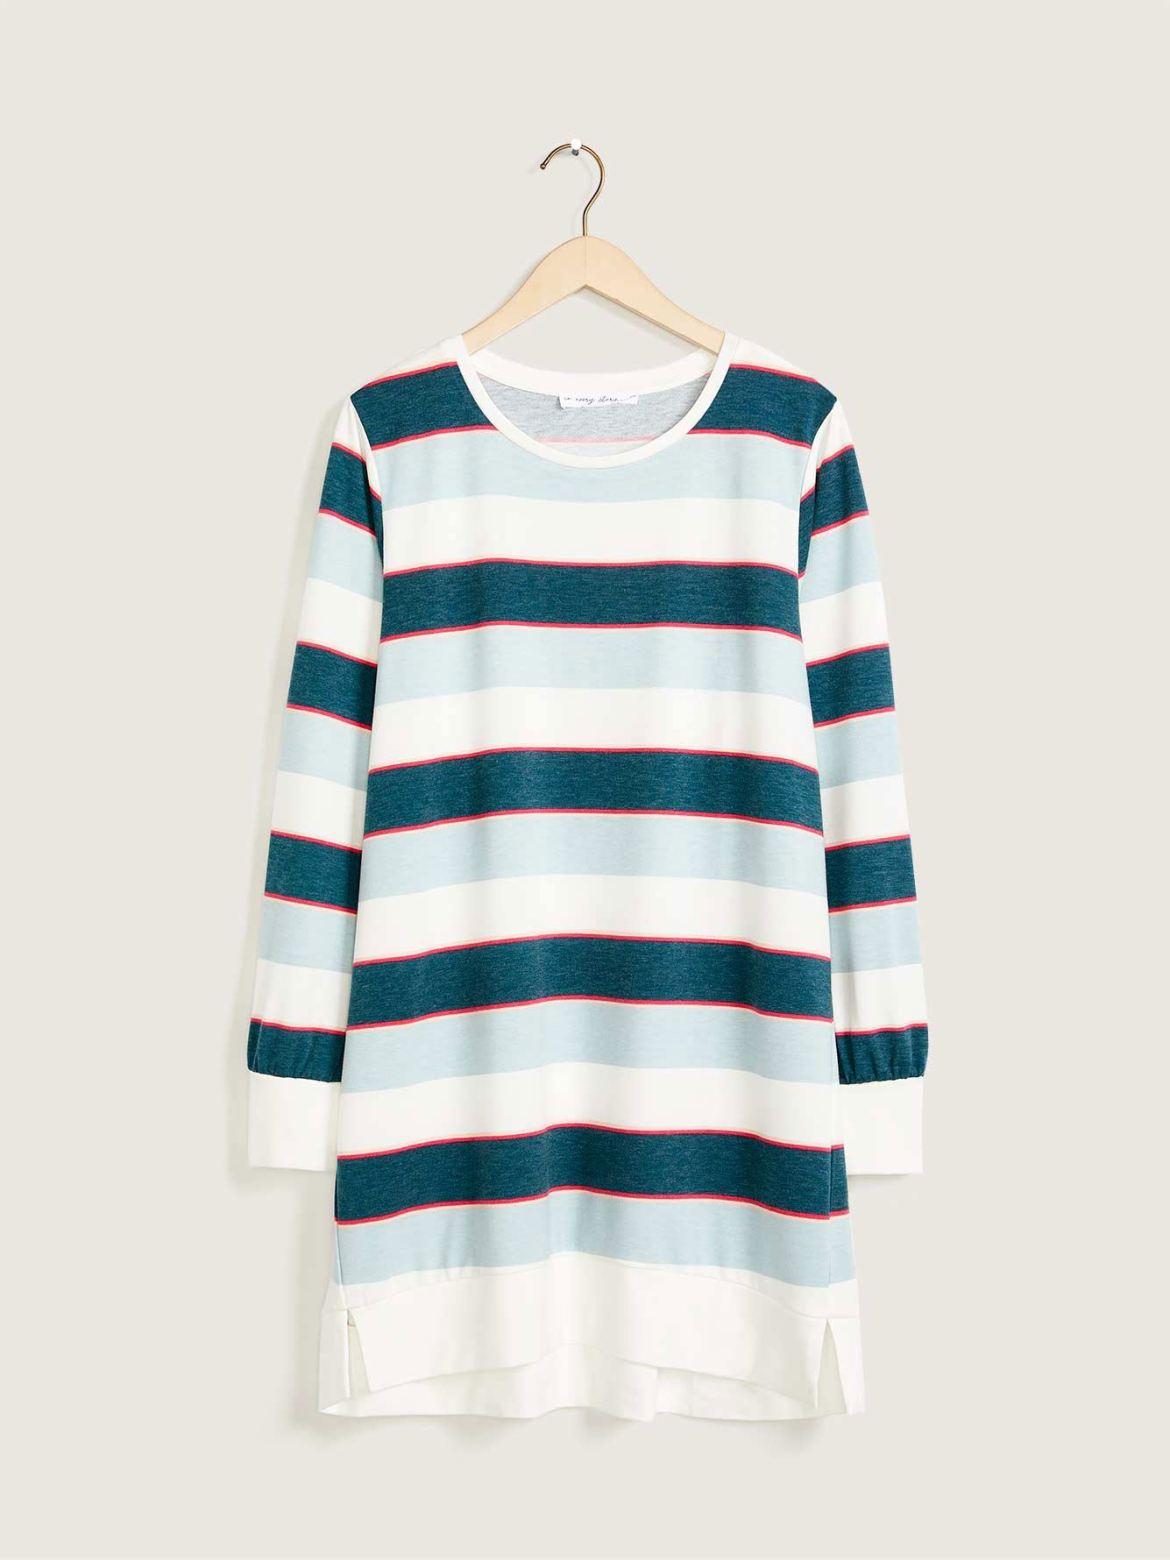 Printed Tunic Sweatshirt - In Every Story